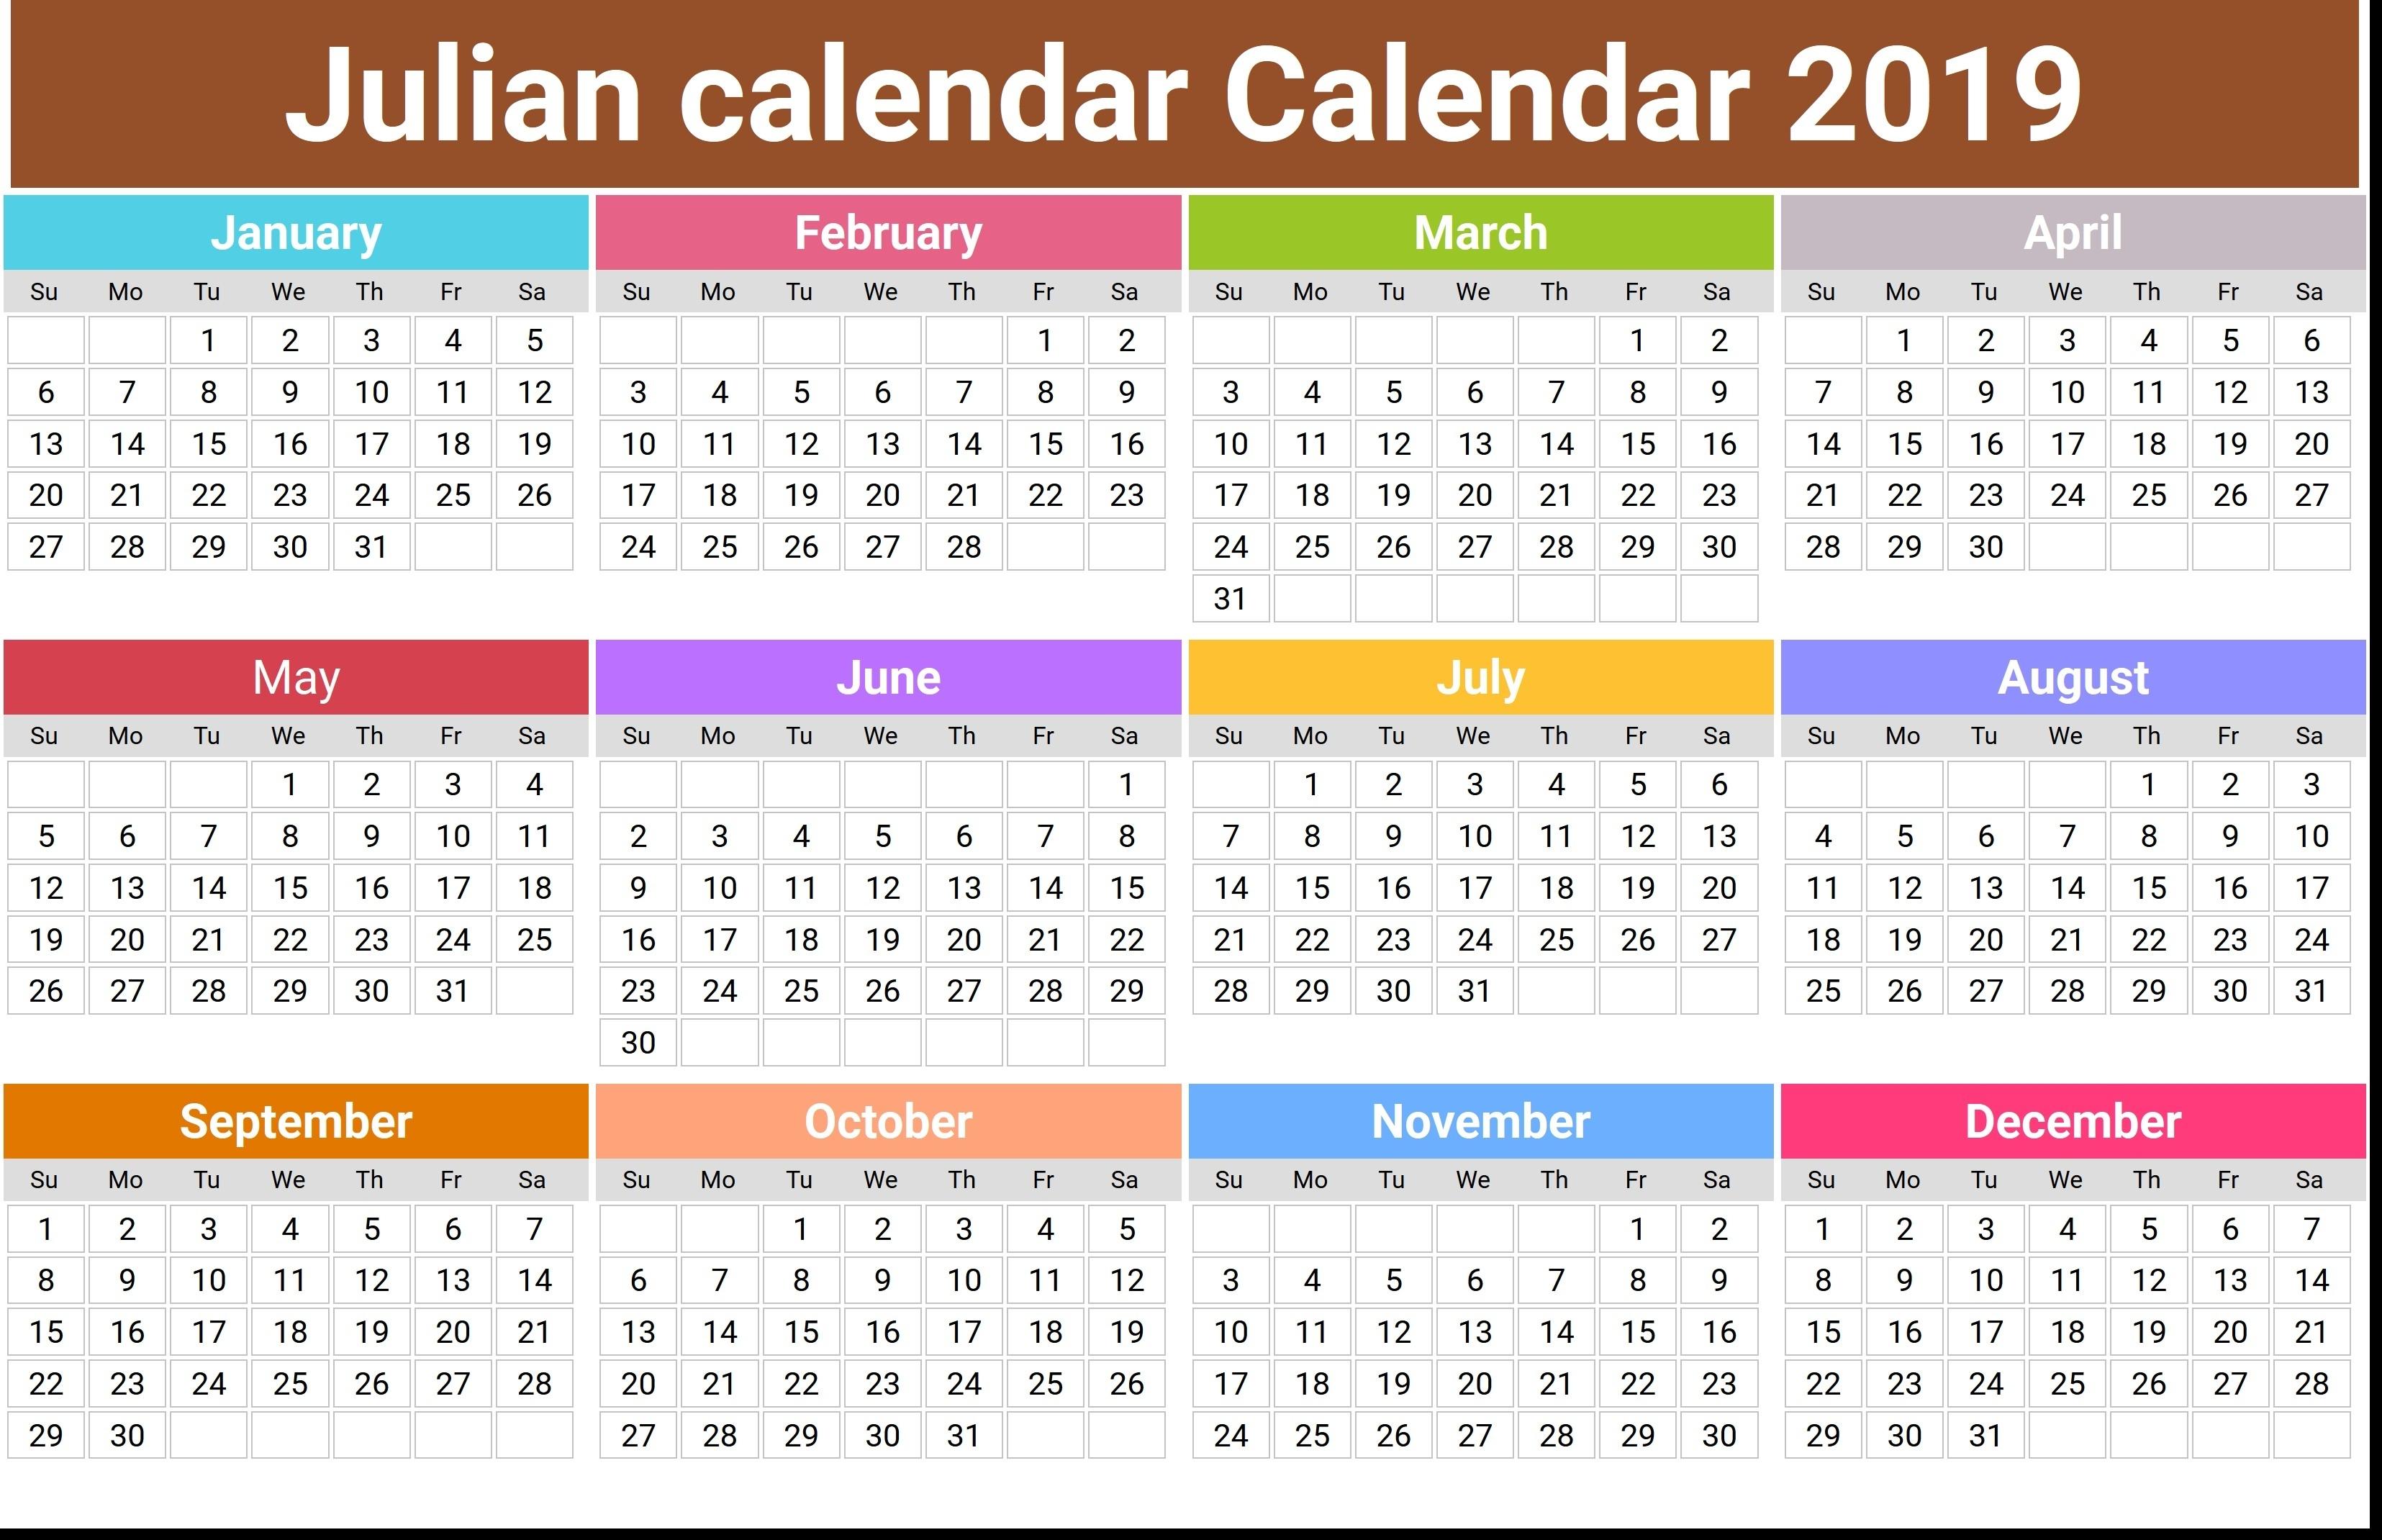 Julian Calendar 2020 2020 Template | Example Calendar Printable for Quadax Julian Calendar 2020